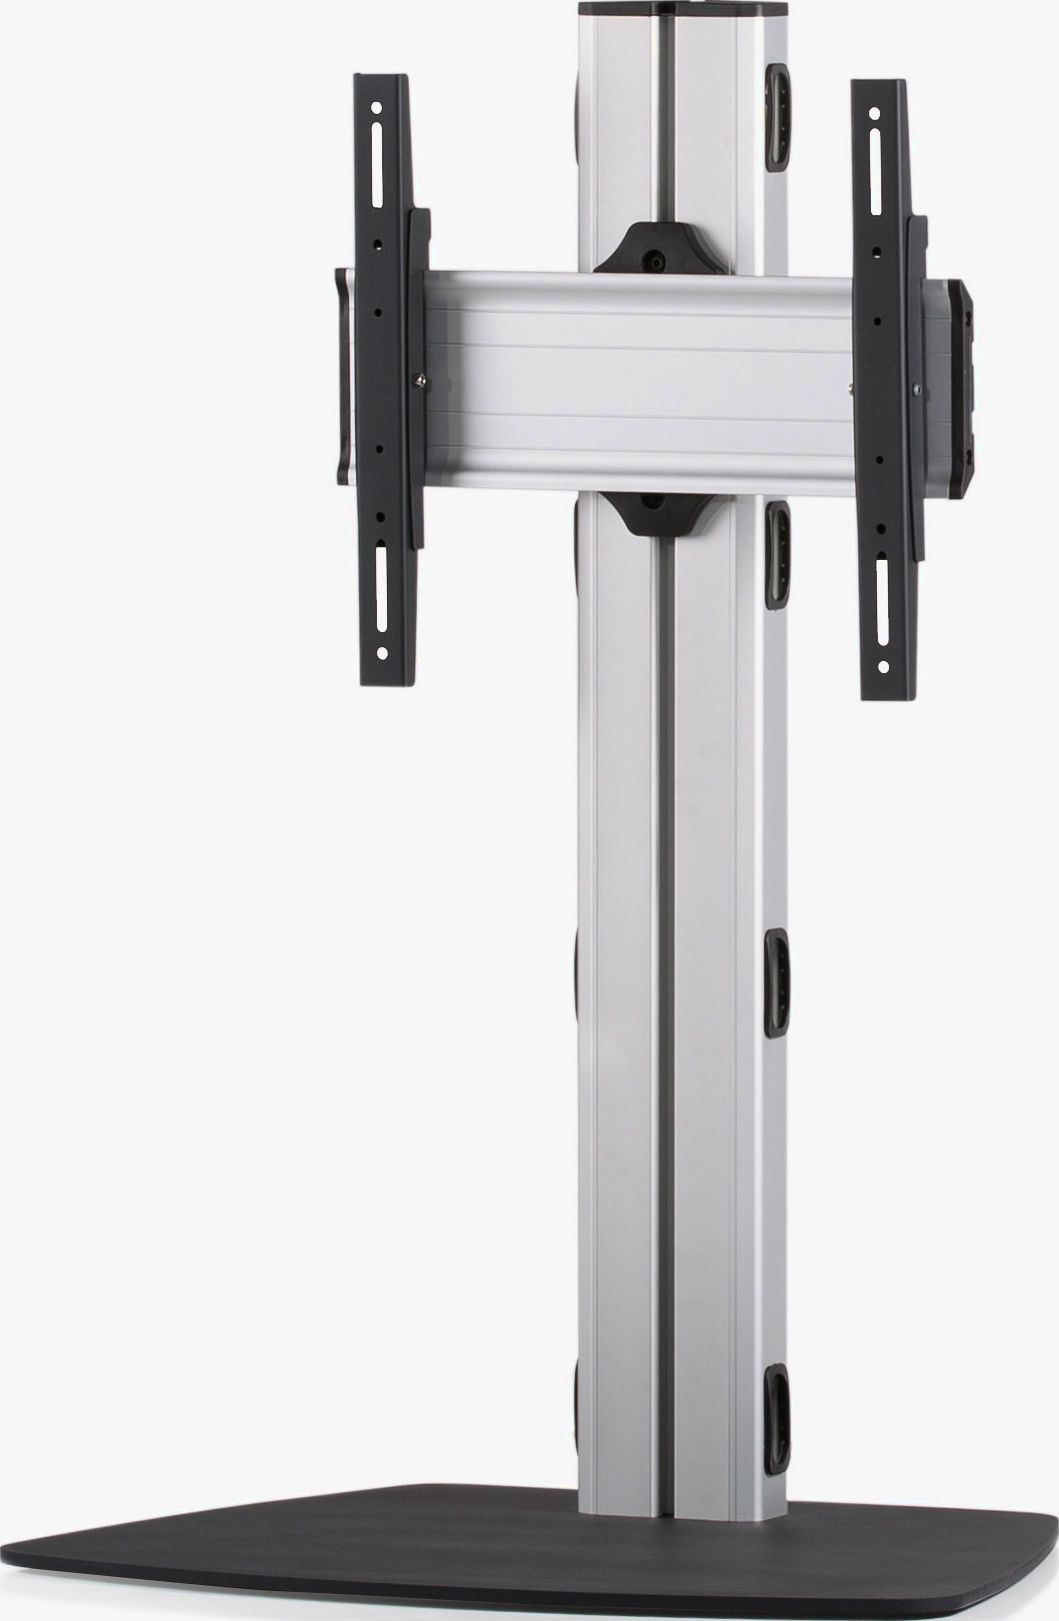 1 Display 1×1, Höhe 110 cm, Standard-VESA, mit Standfuß